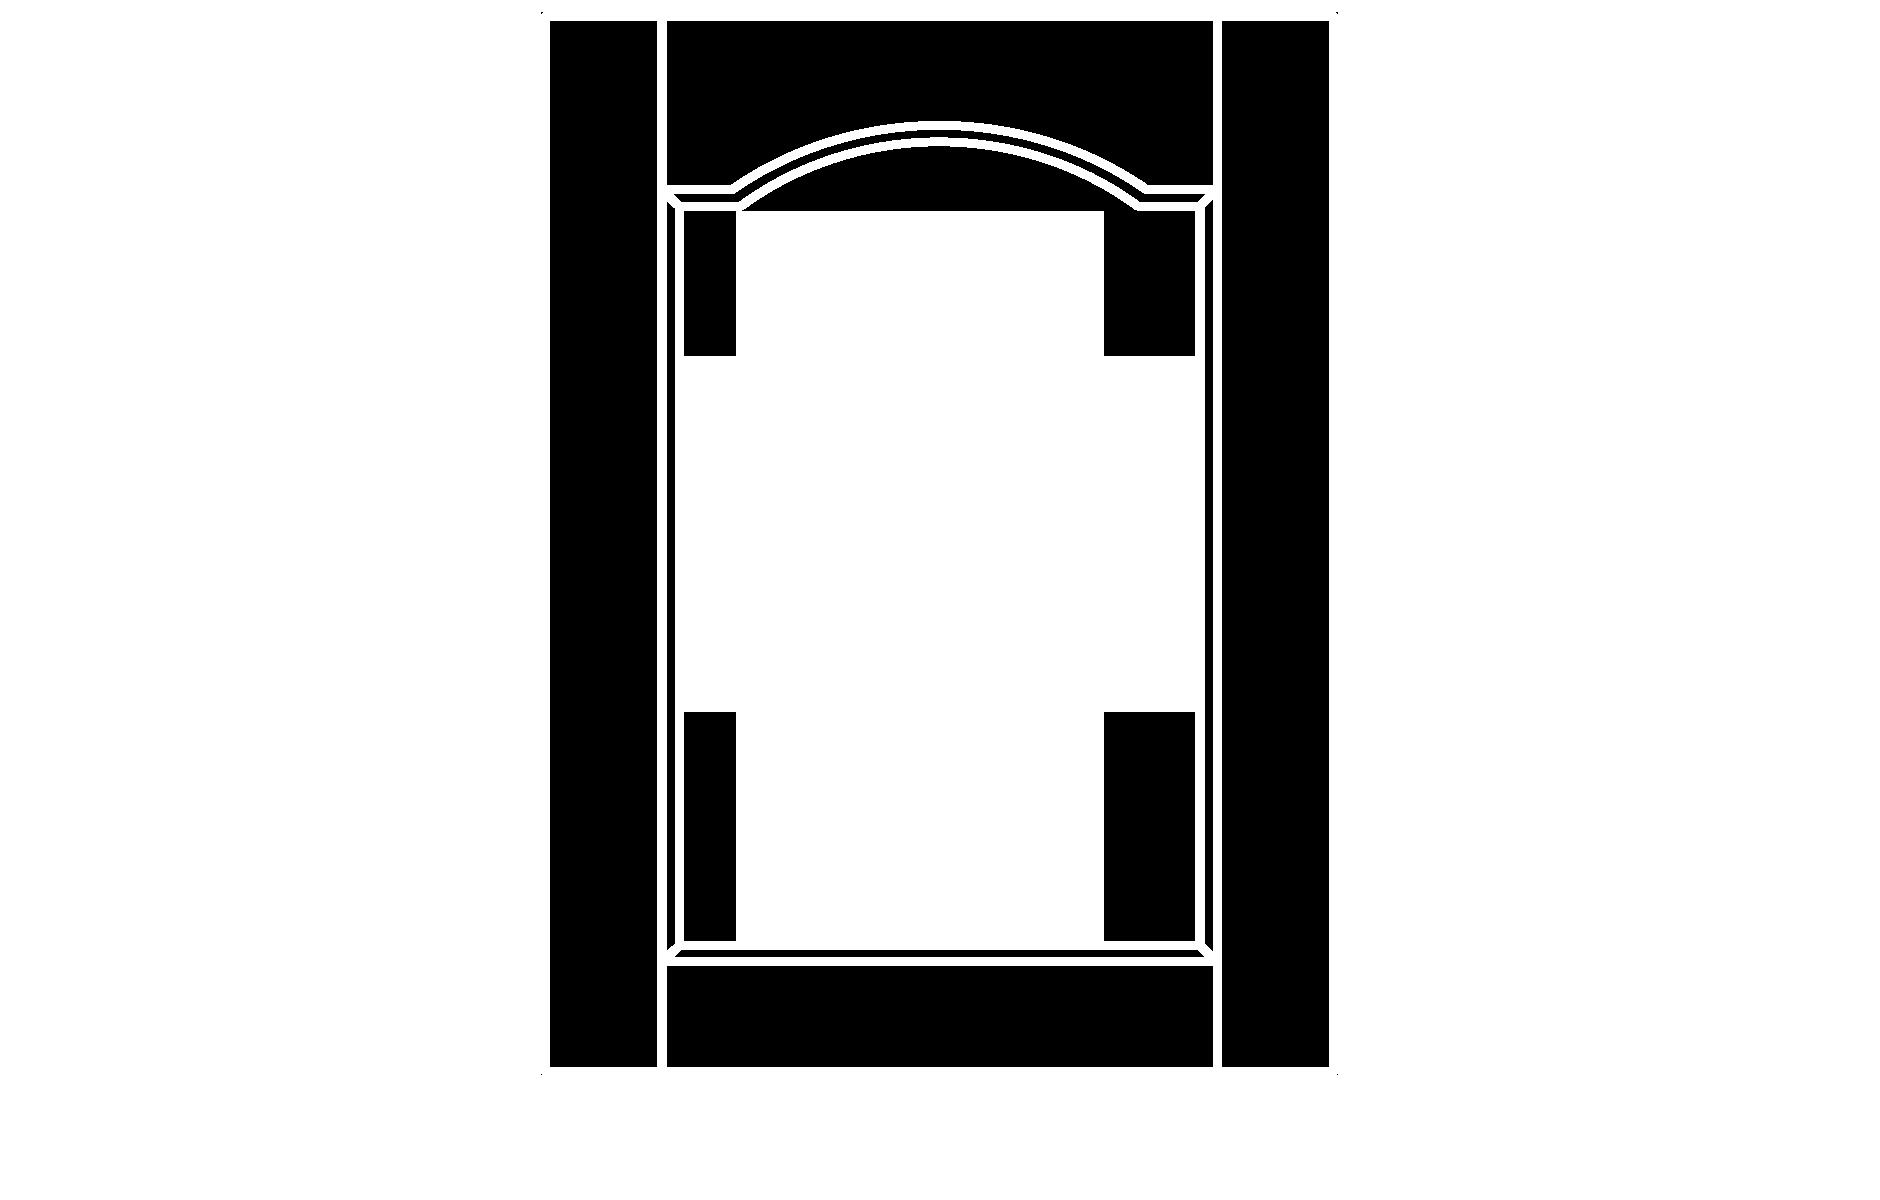 C103 cope and stick cabinet door configuration